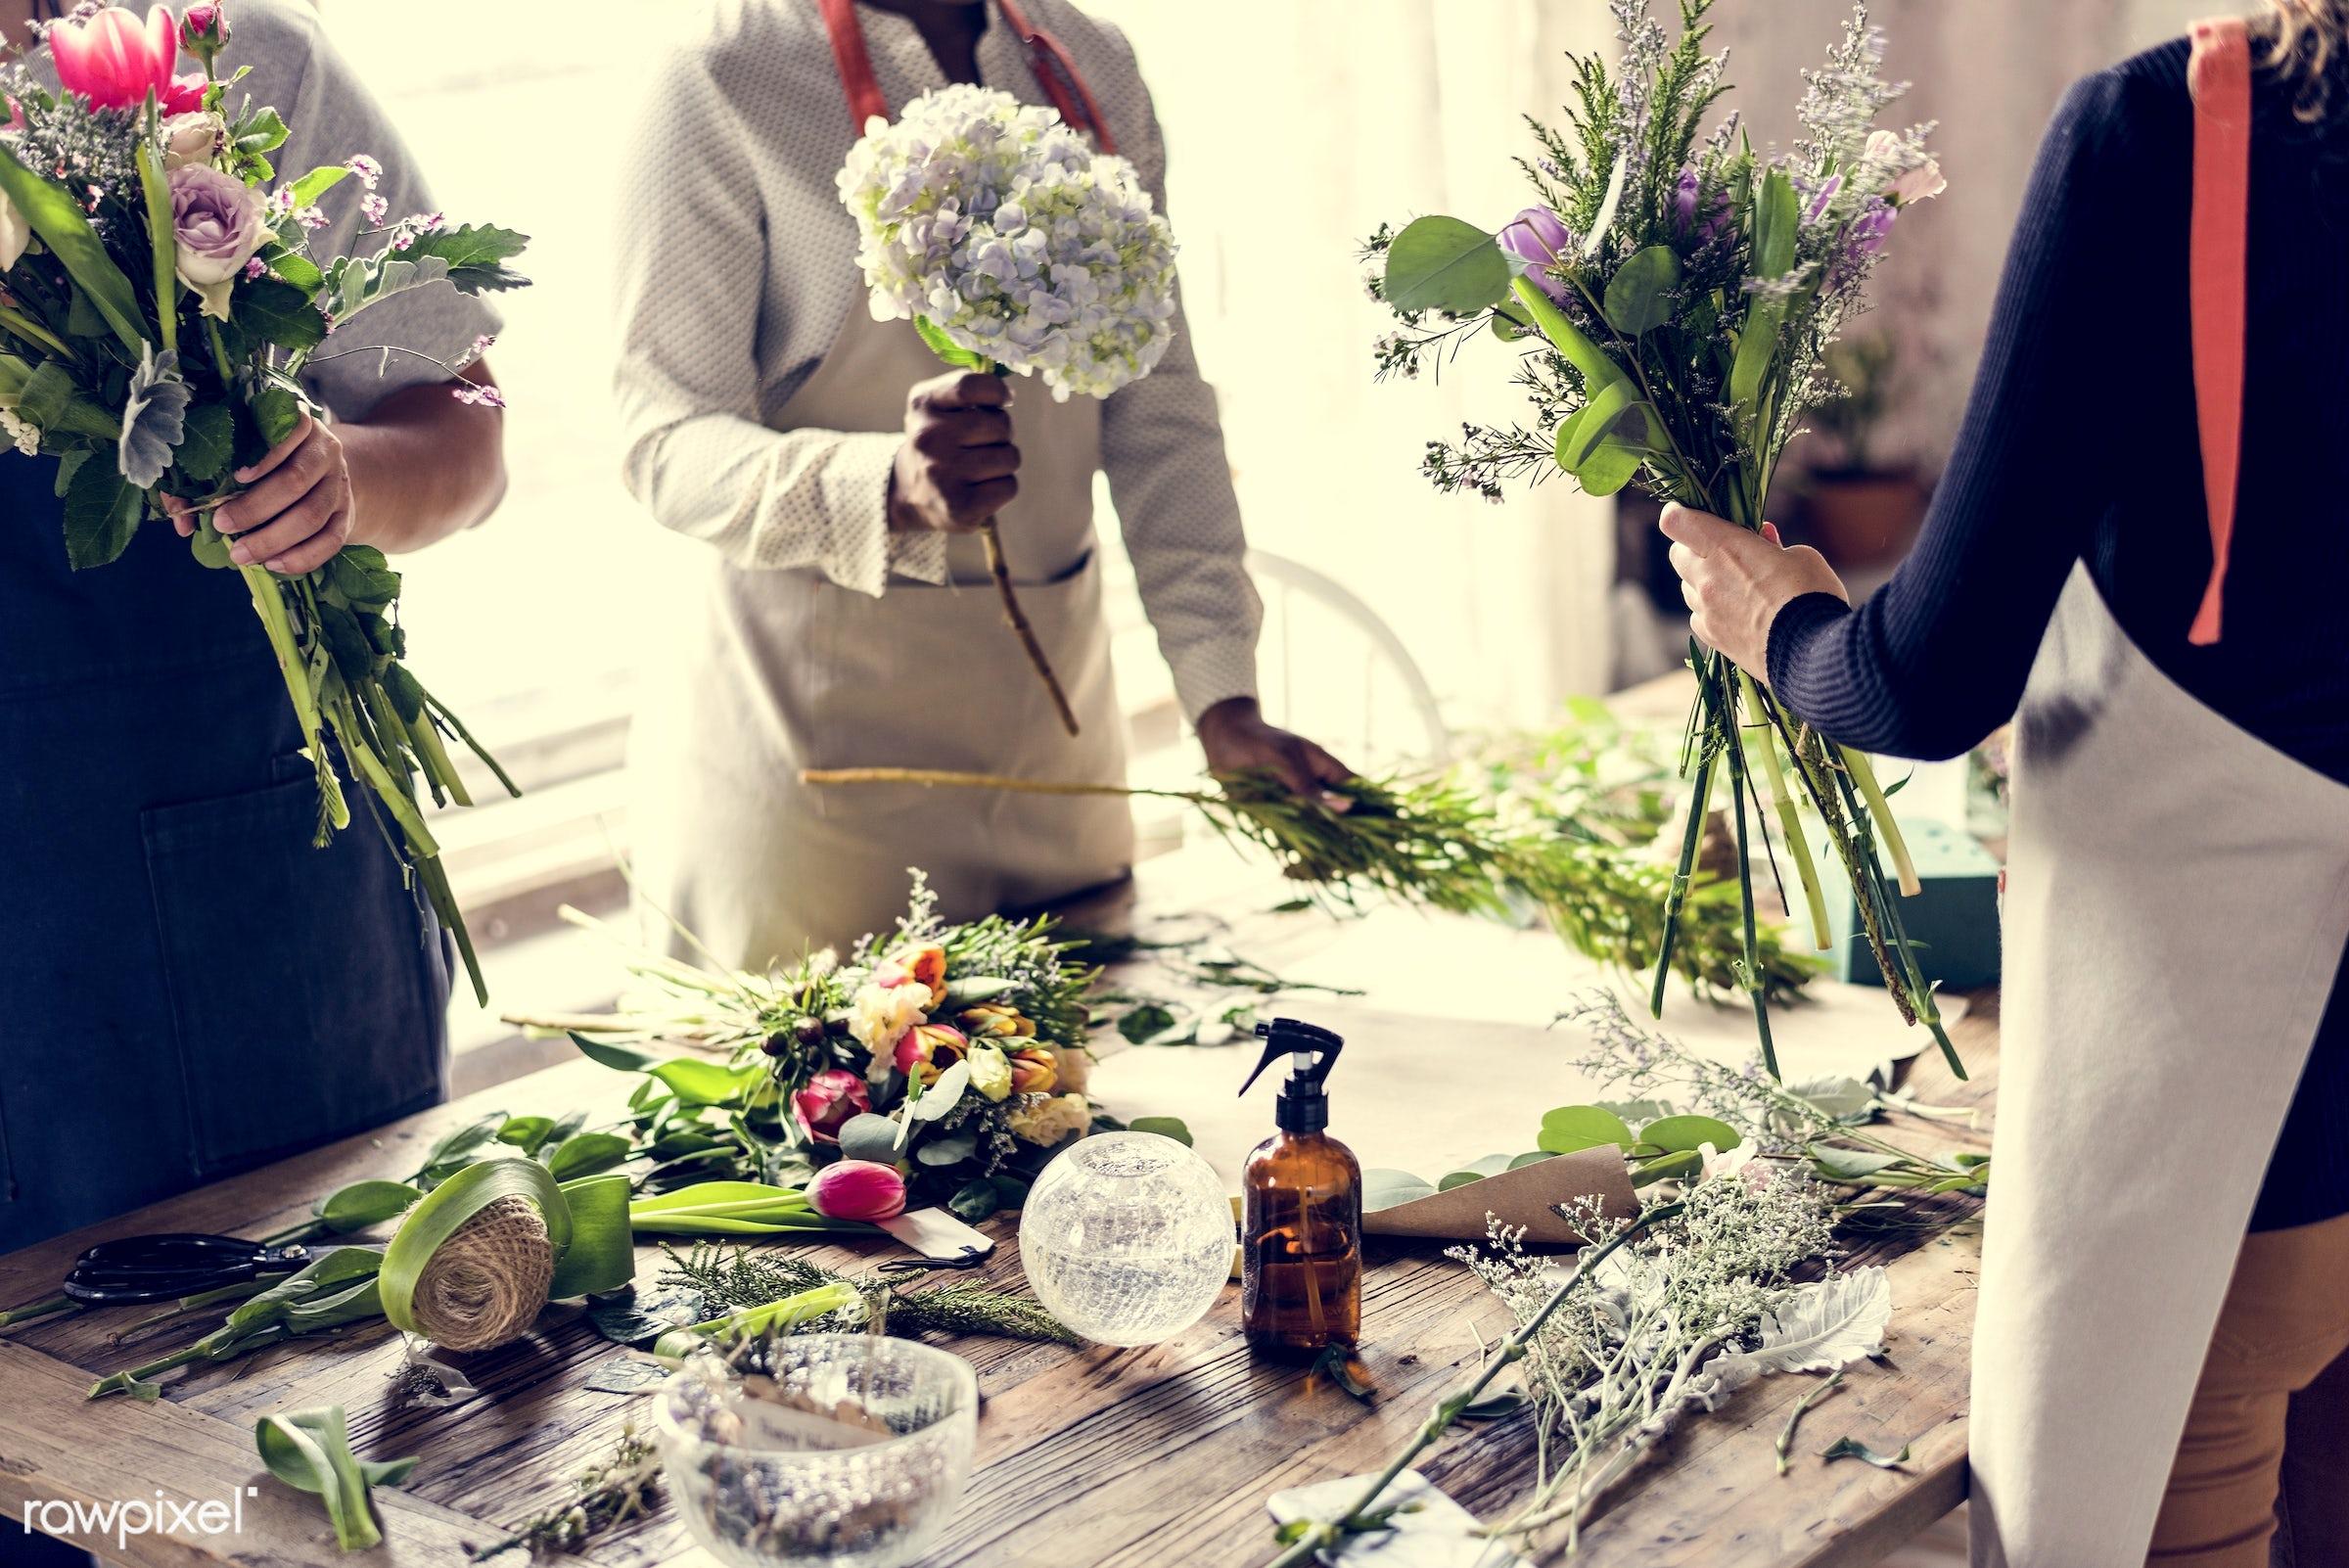 bouquet, shop, detail, person, people, decor, nature, flowers, work, hold, refreshment, career, florist, present,...